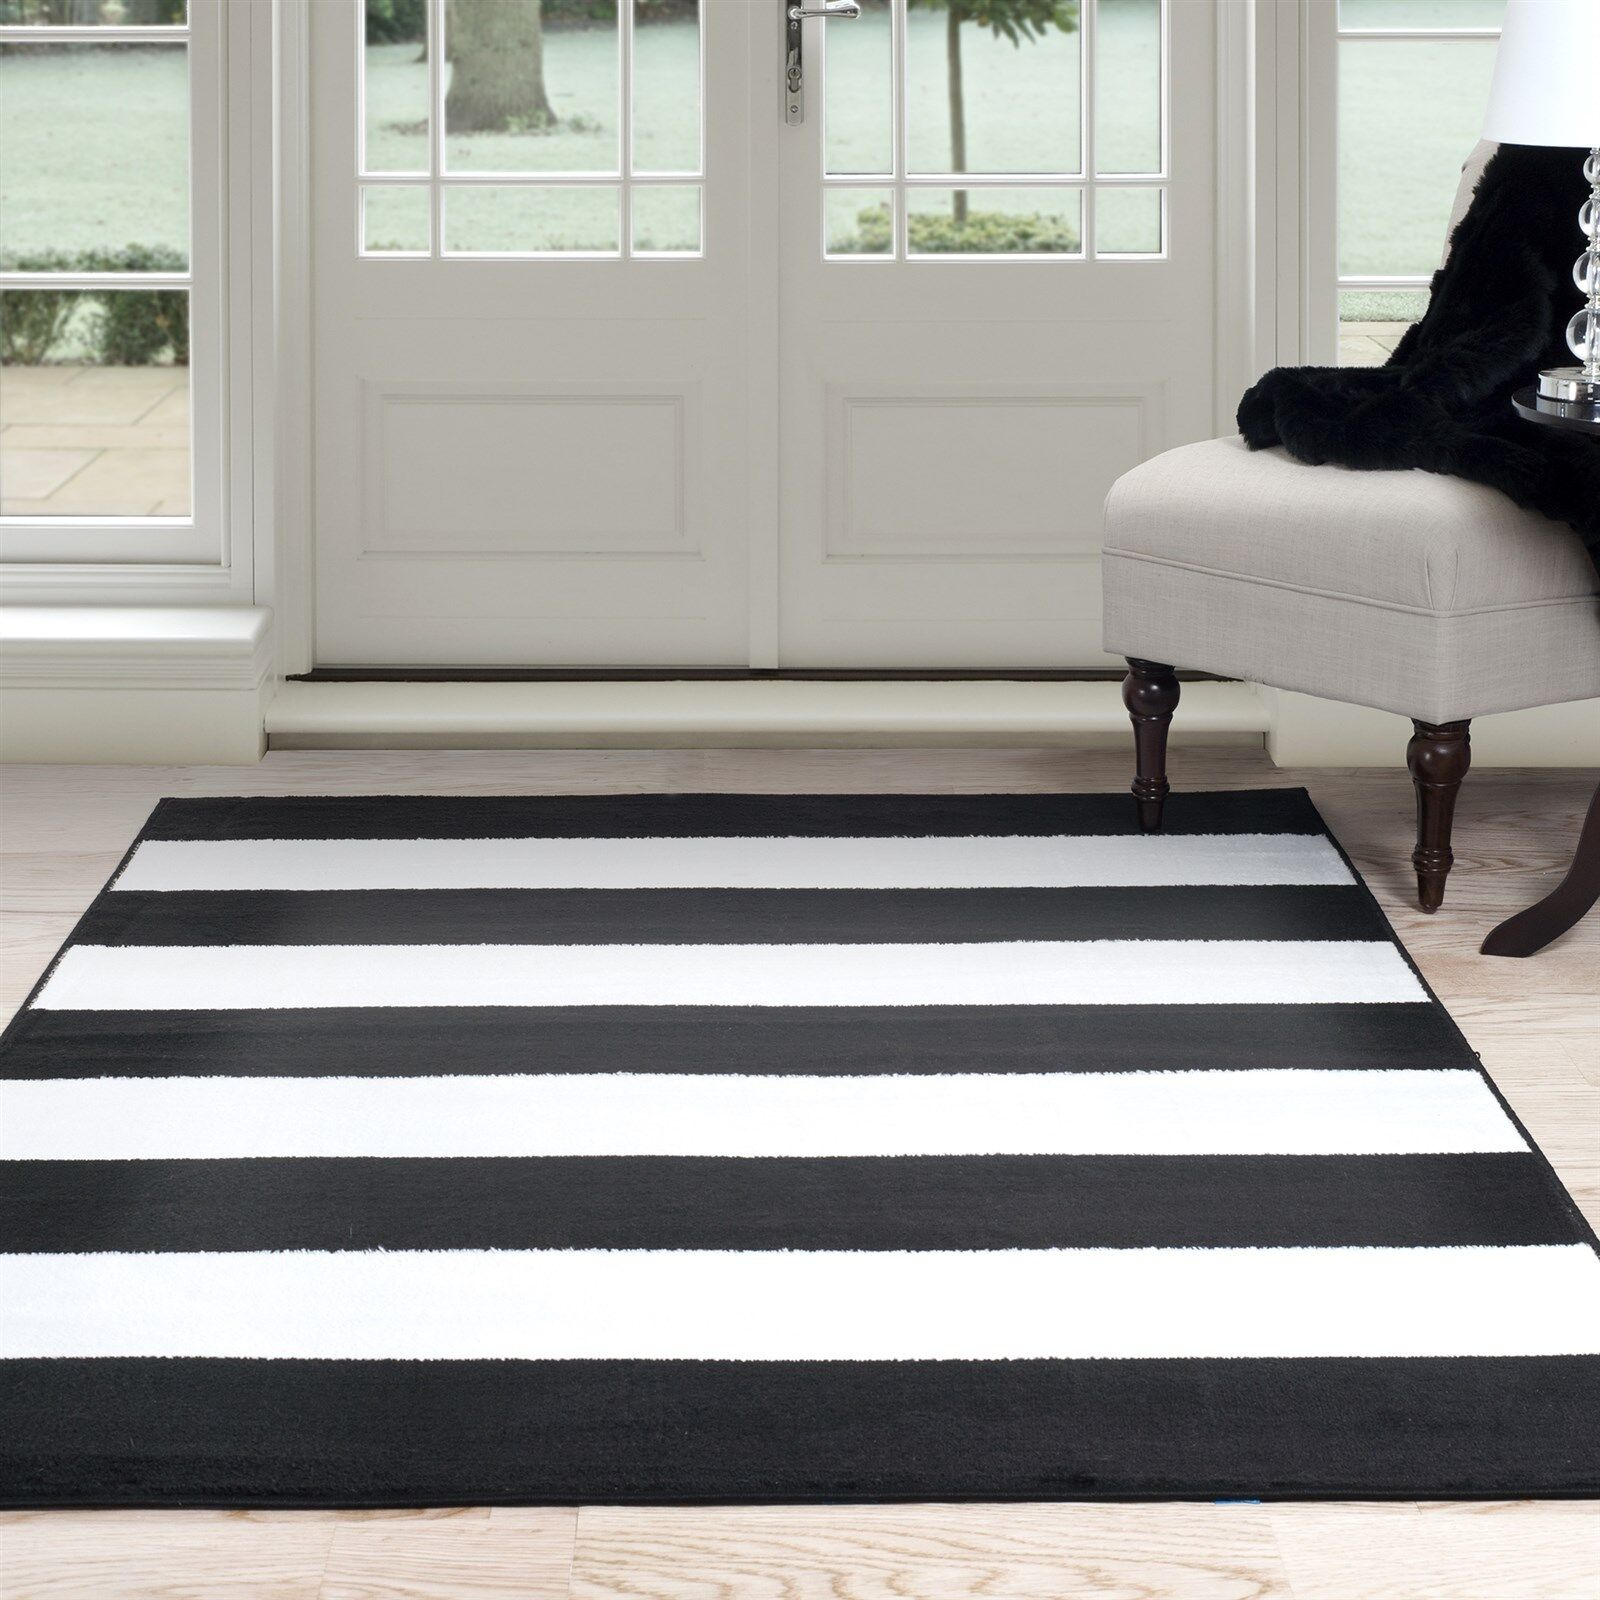 Lavish Home Breton Stripe Area Rug, 5' by 7'7, Black/White